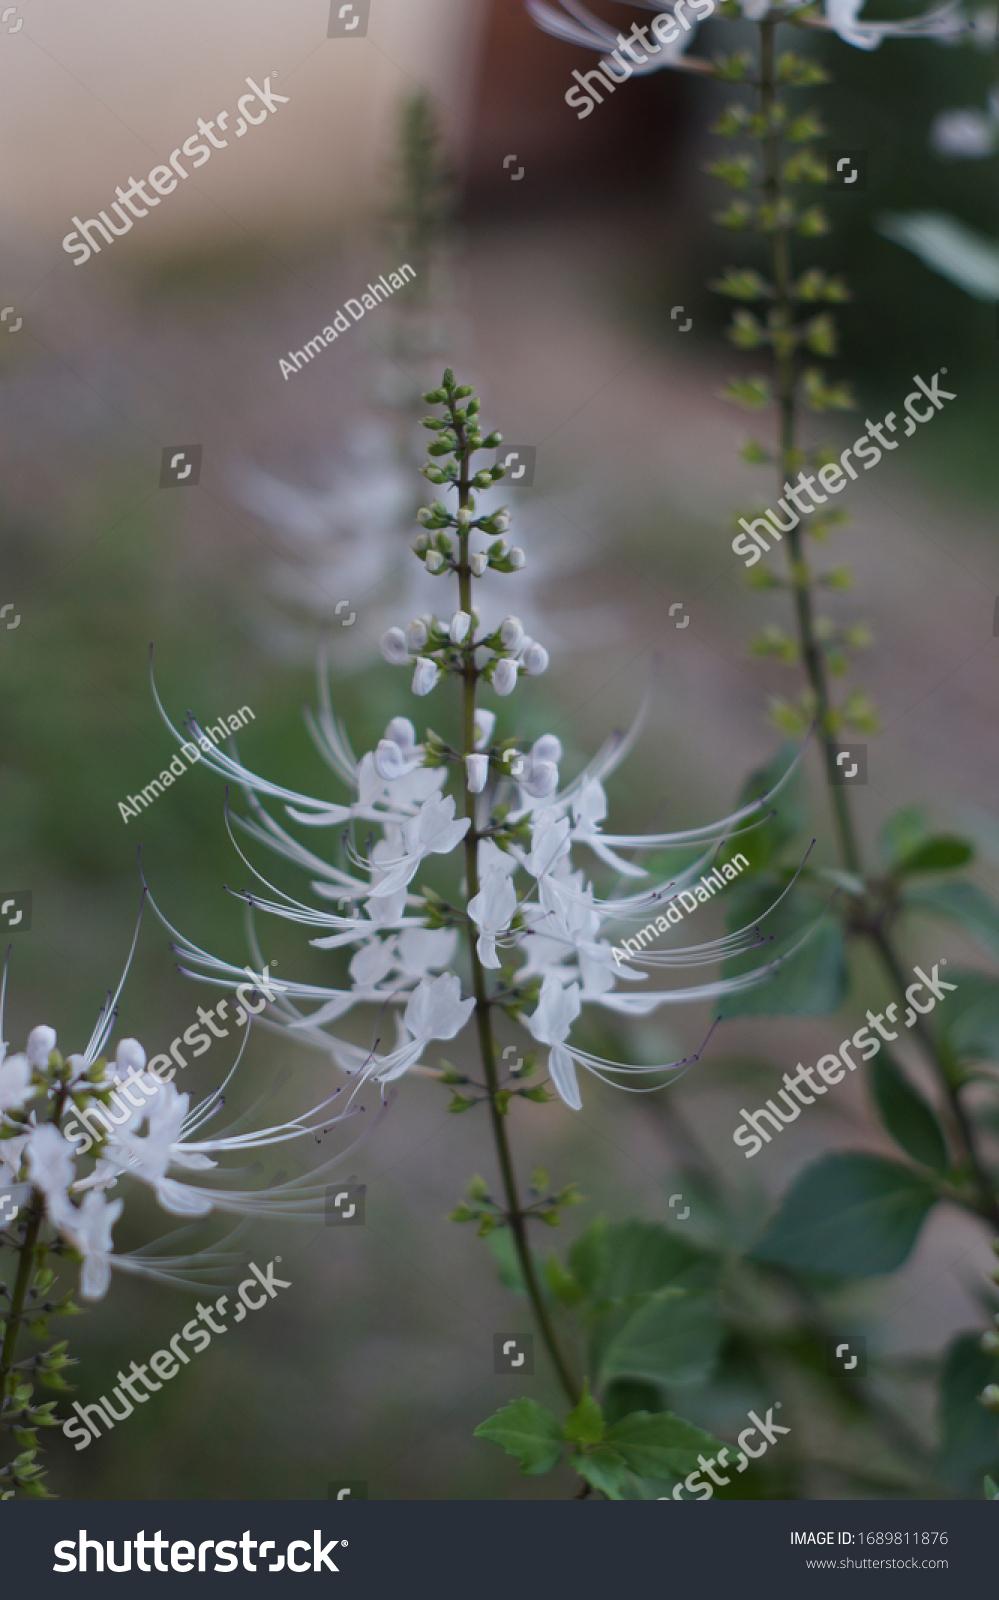 Orthosiphon aristatus -  cat's whiskers or Java tea blossoming flower